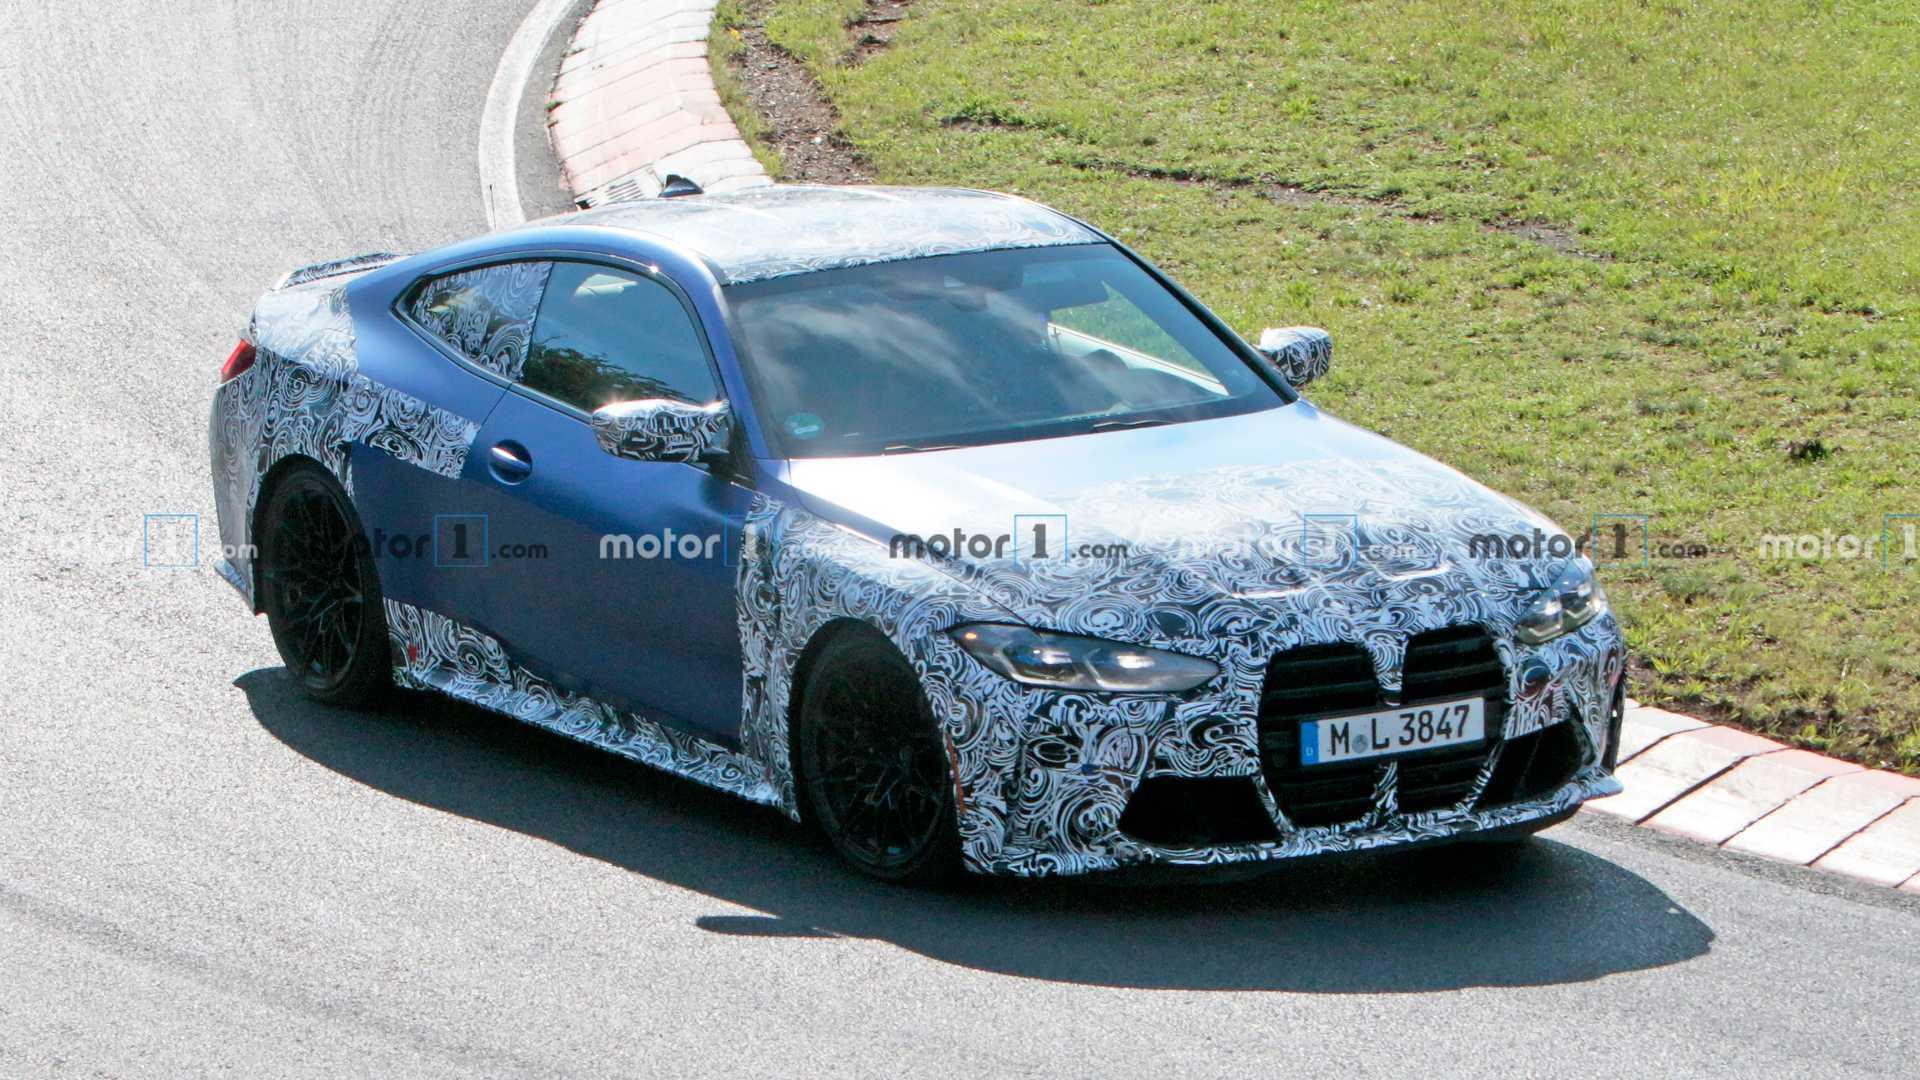 2020 - [BMW] M3/M4 - Page 19 2021-bmw-m4-at-nurburgring-front-three-quarters